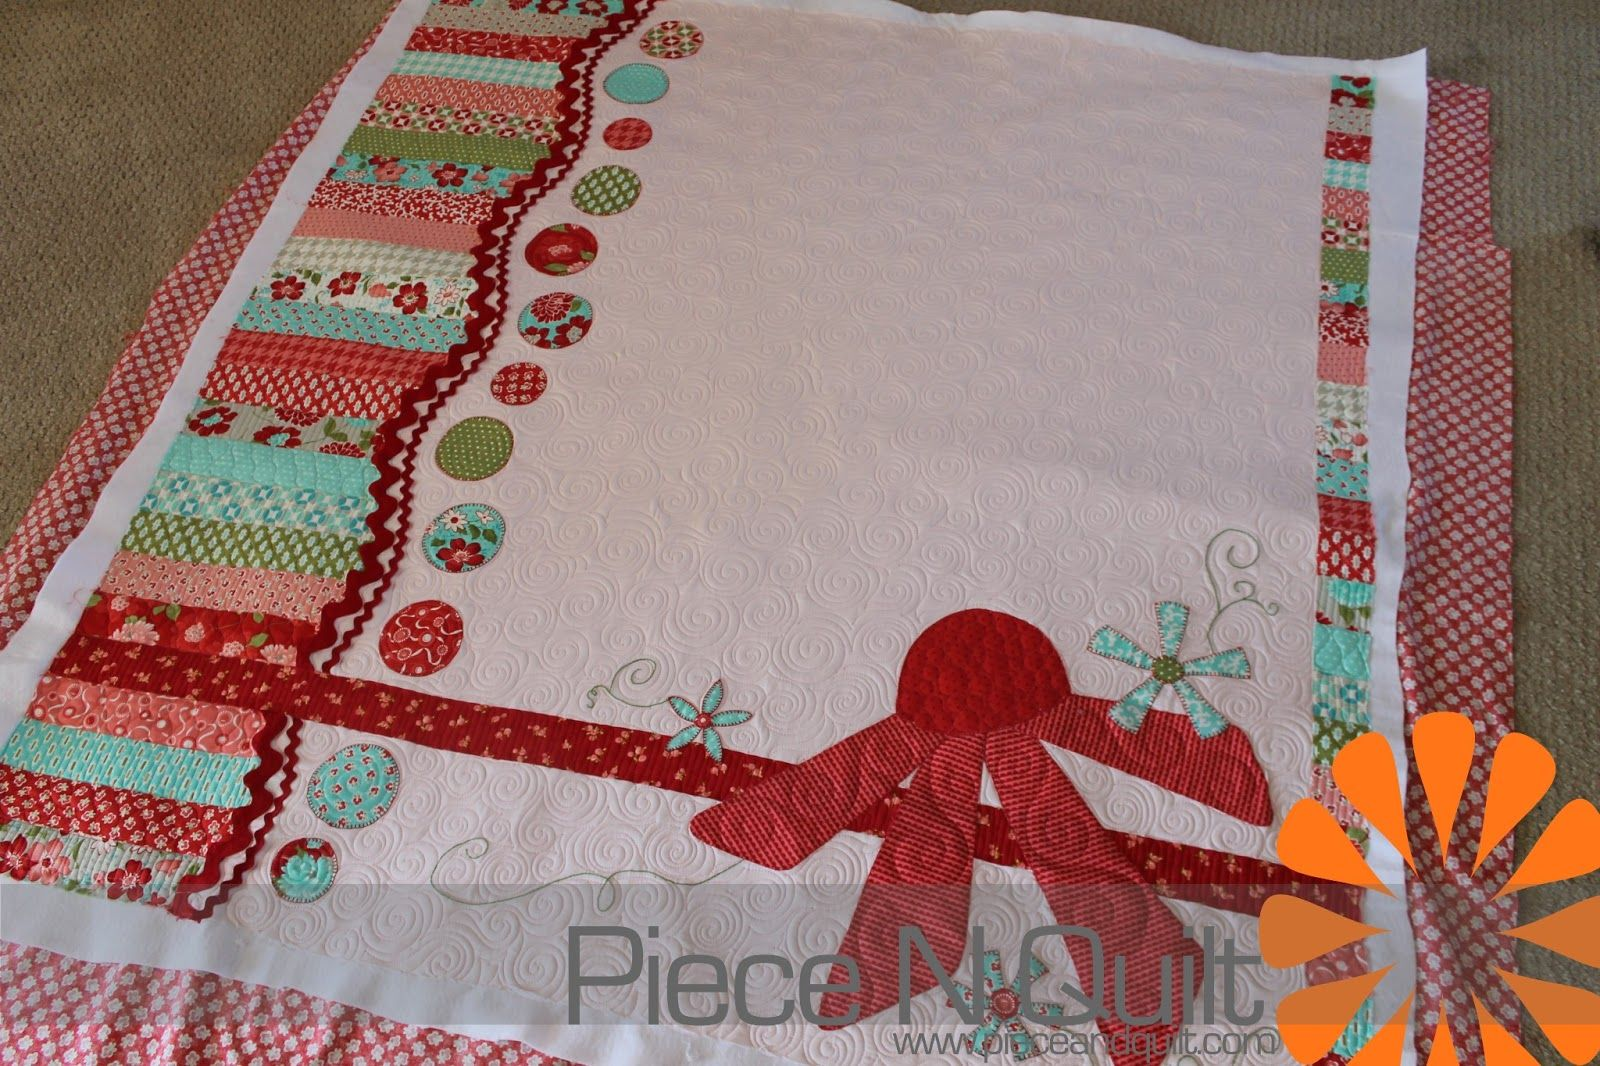 Piece N Quilt: Little Girl Quilt | Quilts for Little Ones ... : piece n quilt - Adamdwight.com